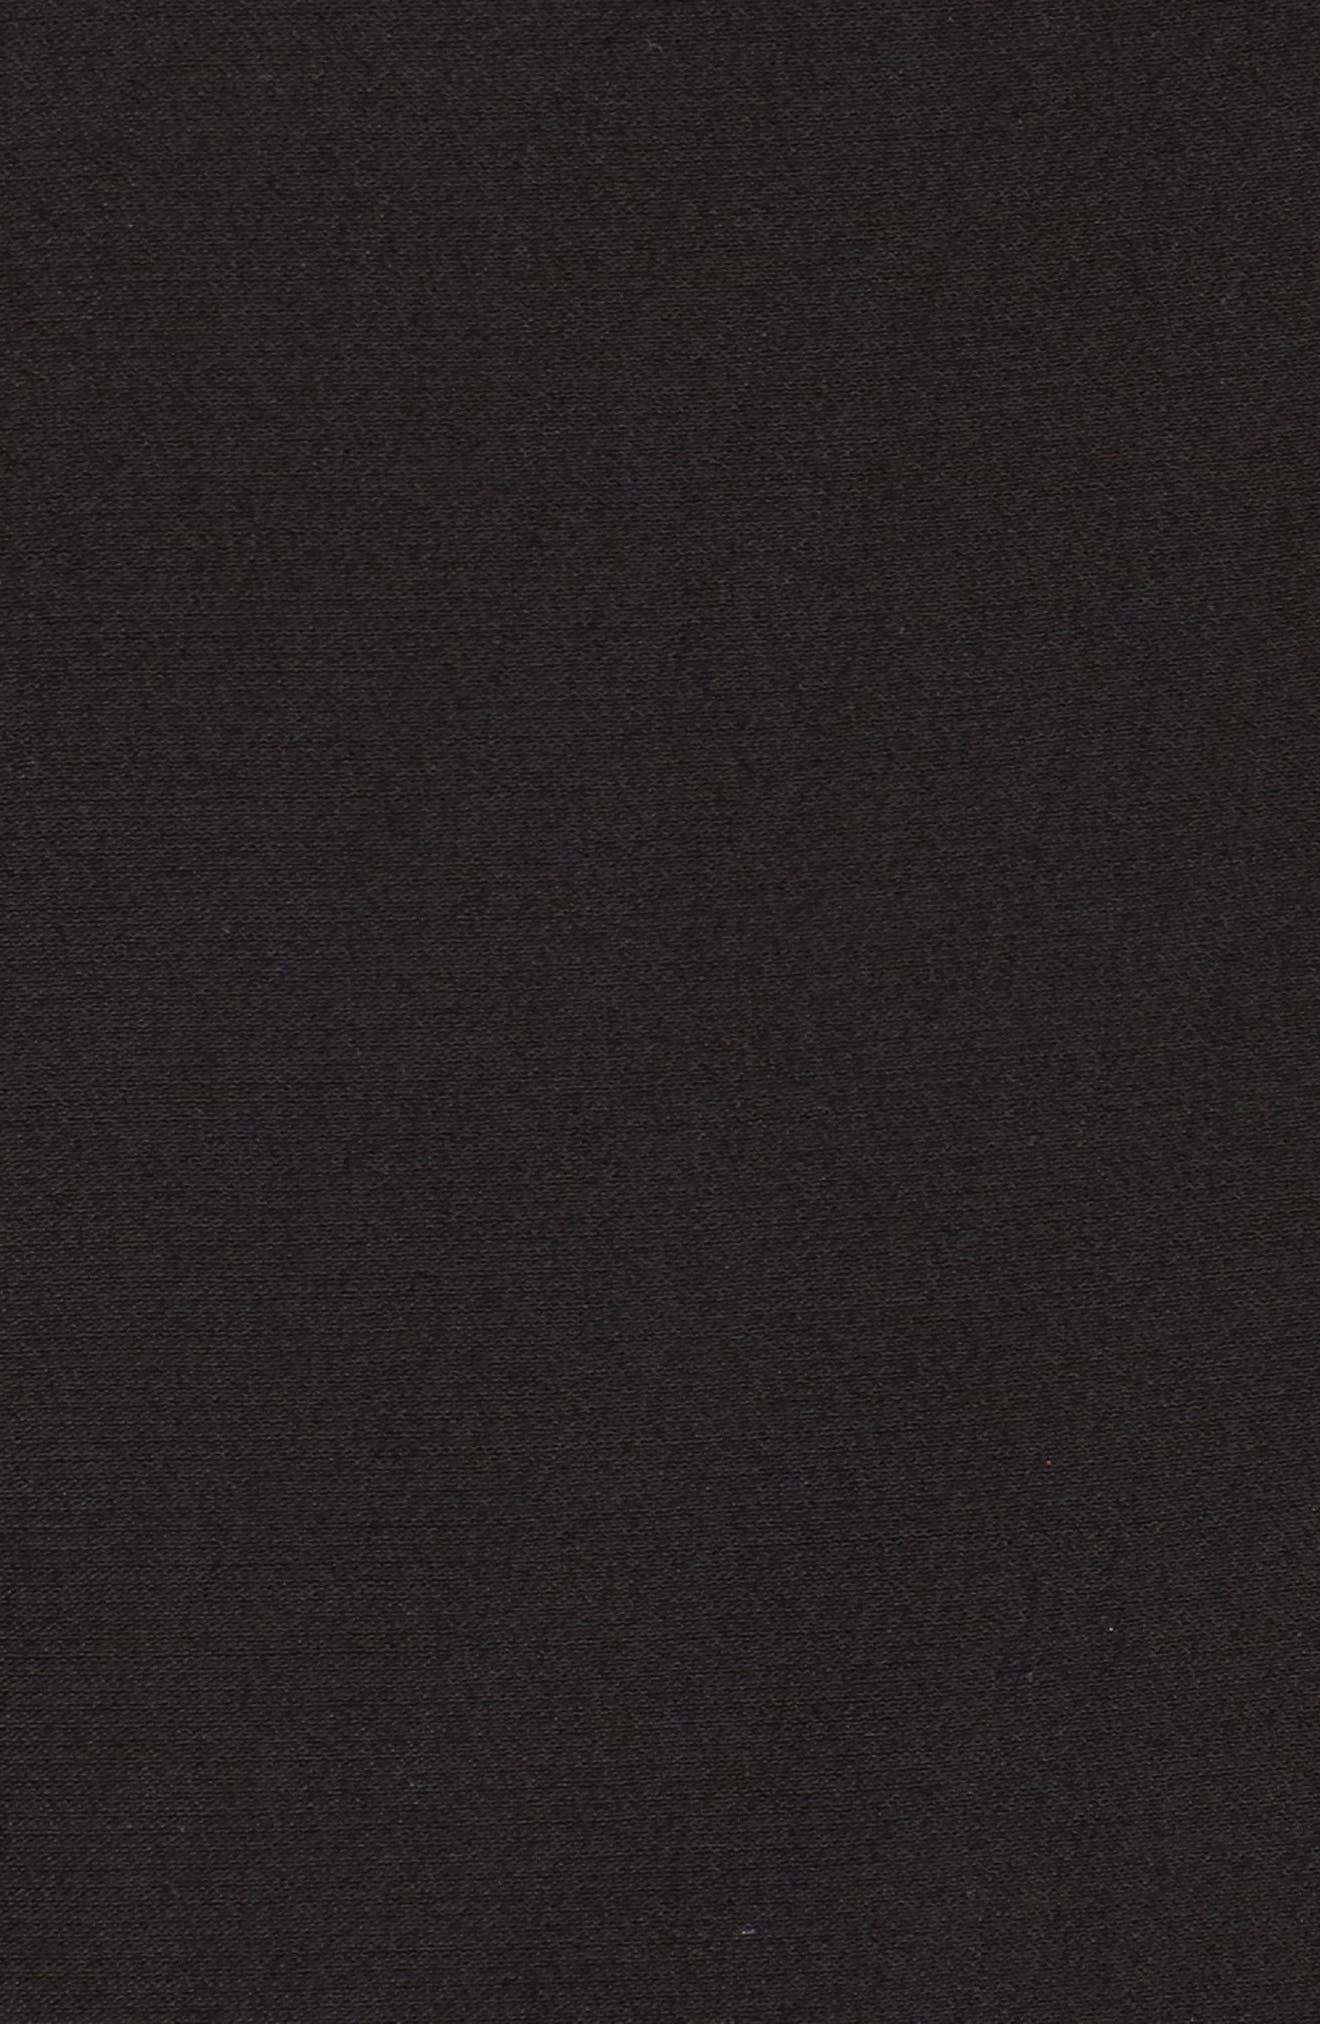 One-Shoulder Sheath Dress,                             Alternate thumbnail 5, color,                             004